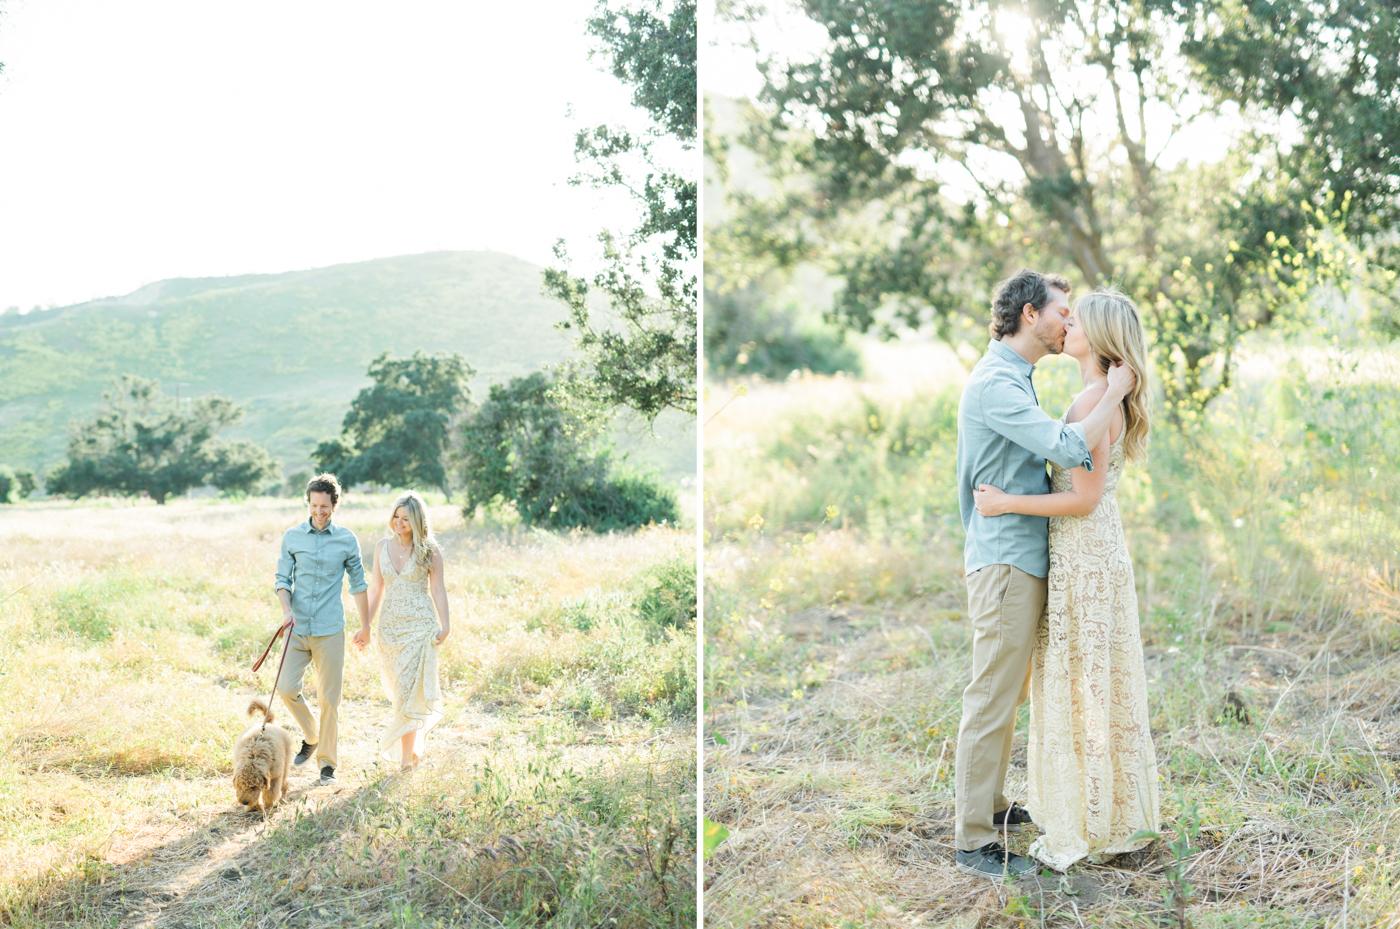 San_Juan_Capistrano_Goldendoodle_family_portrait_session_los_angeles_wedding_photographer-6.jpg